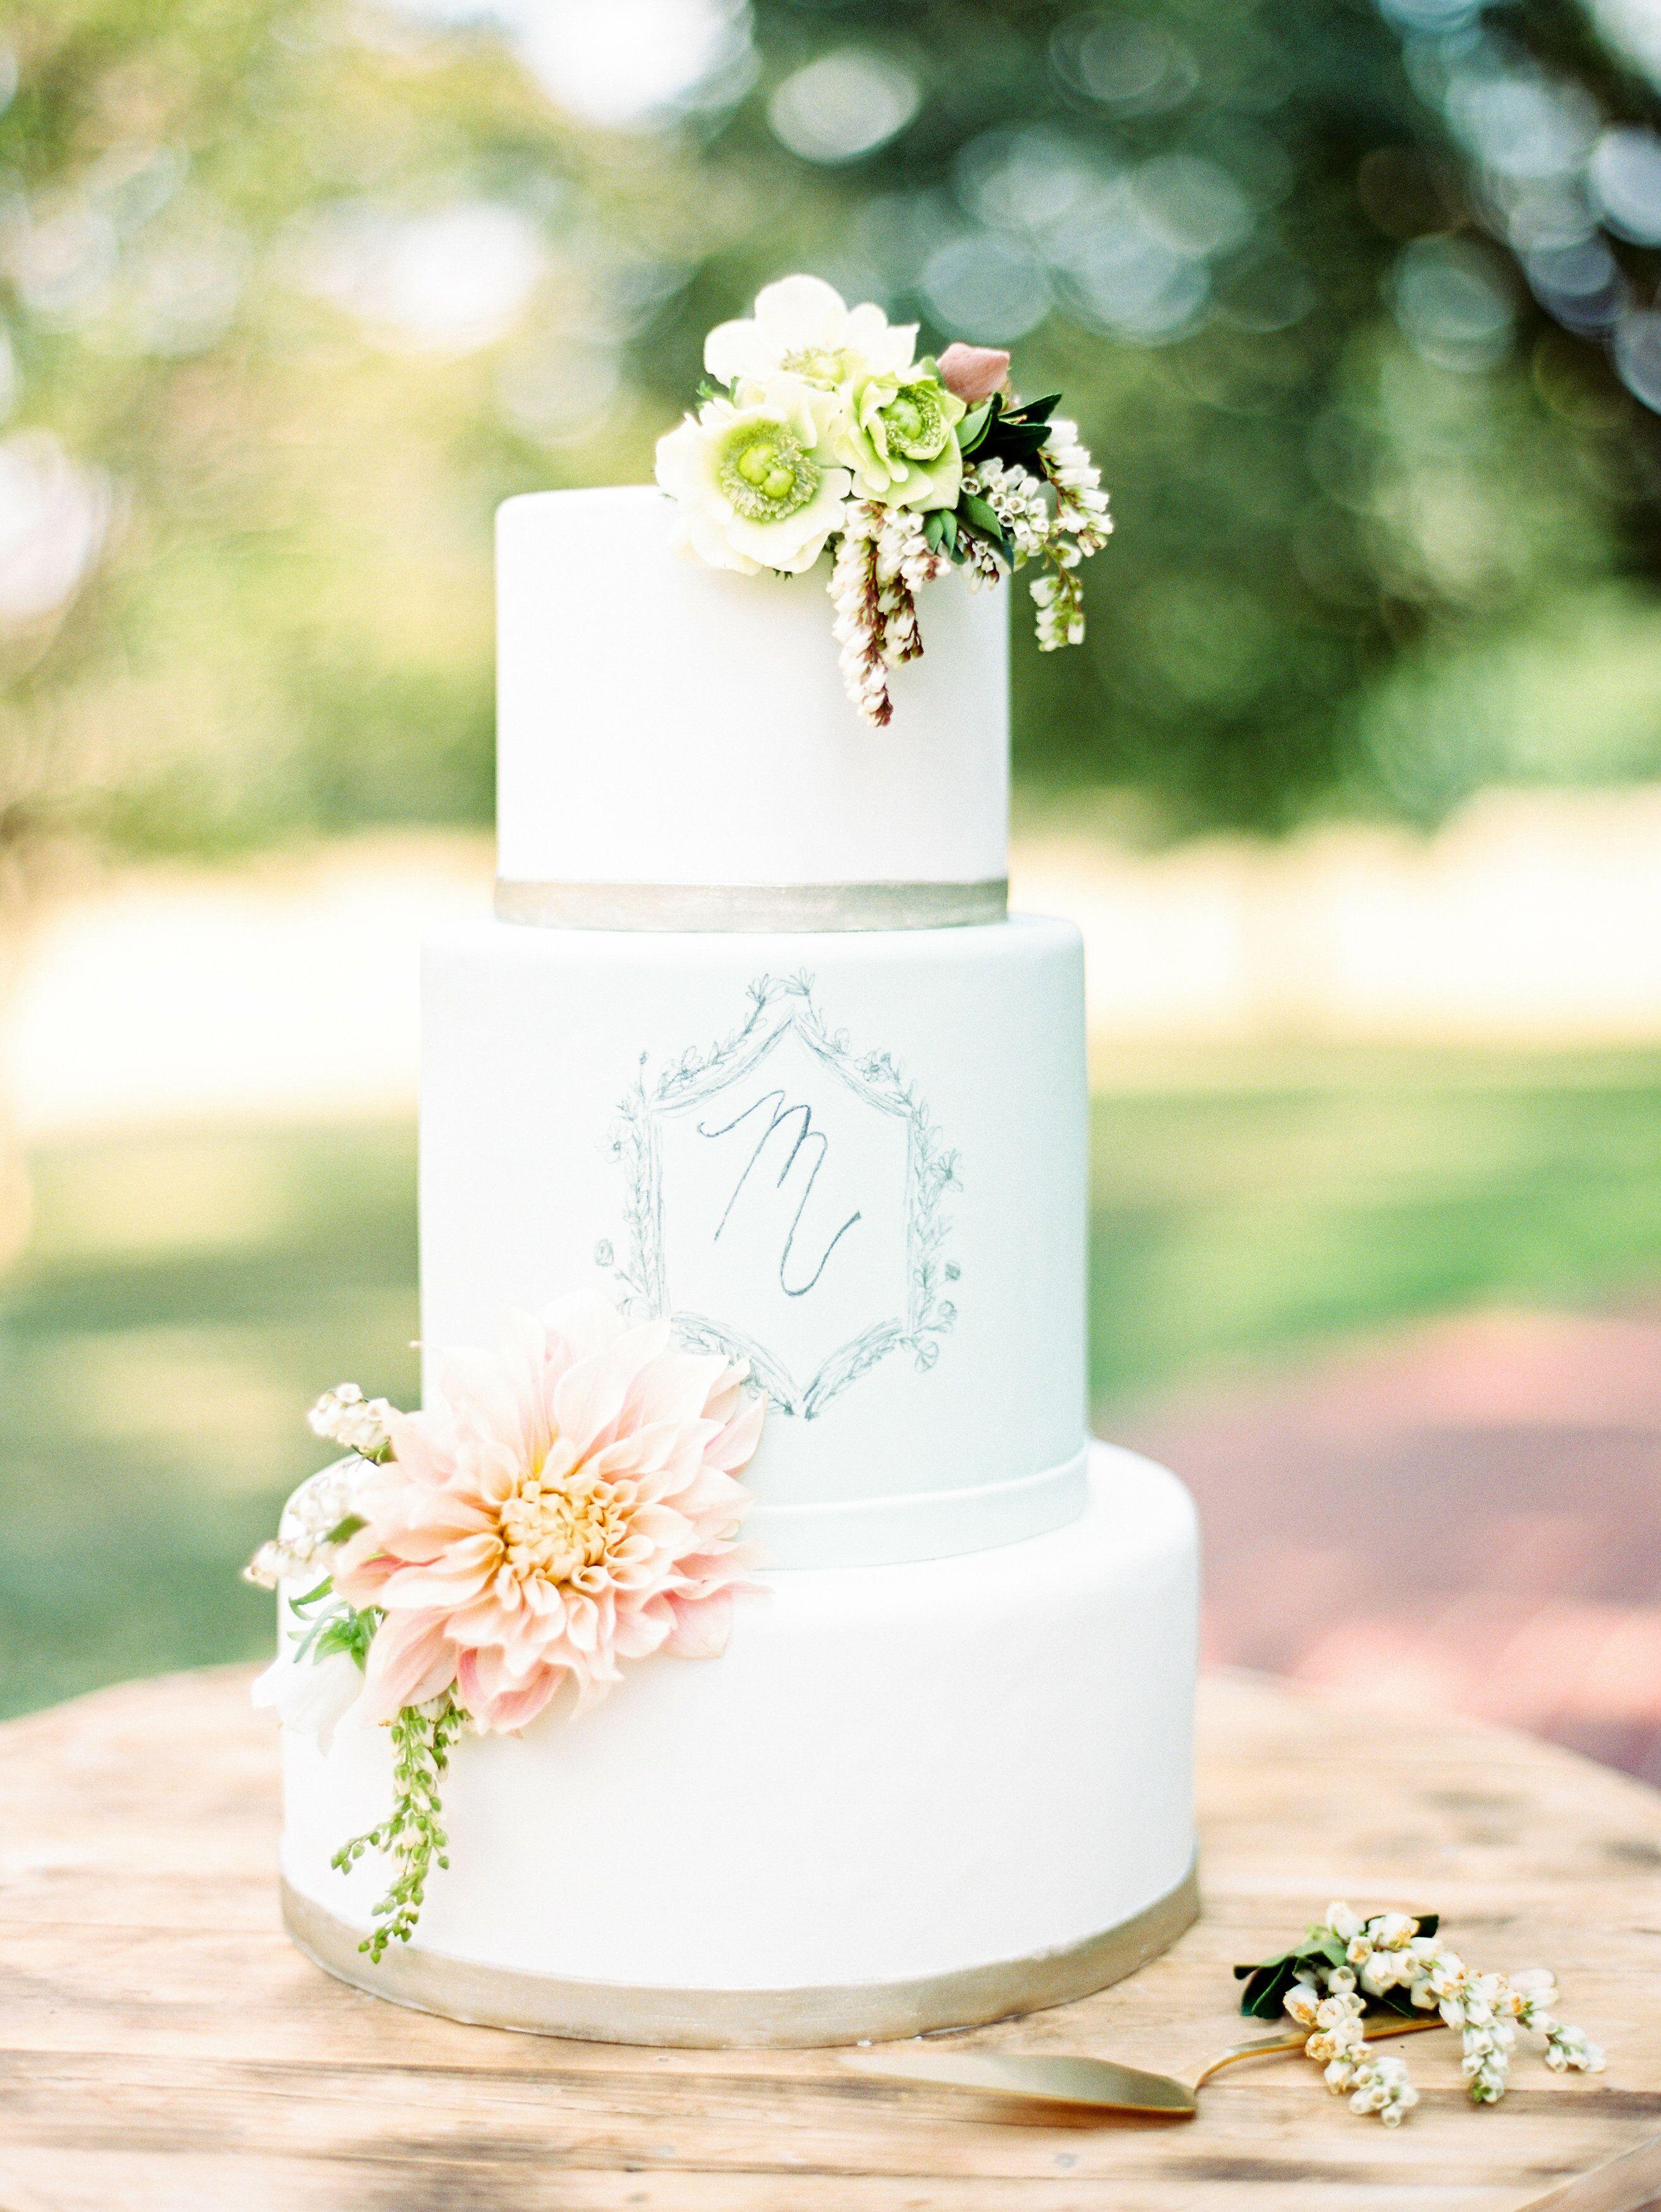 Wedding Cake Bakeries in Hurst, TX - The Knot